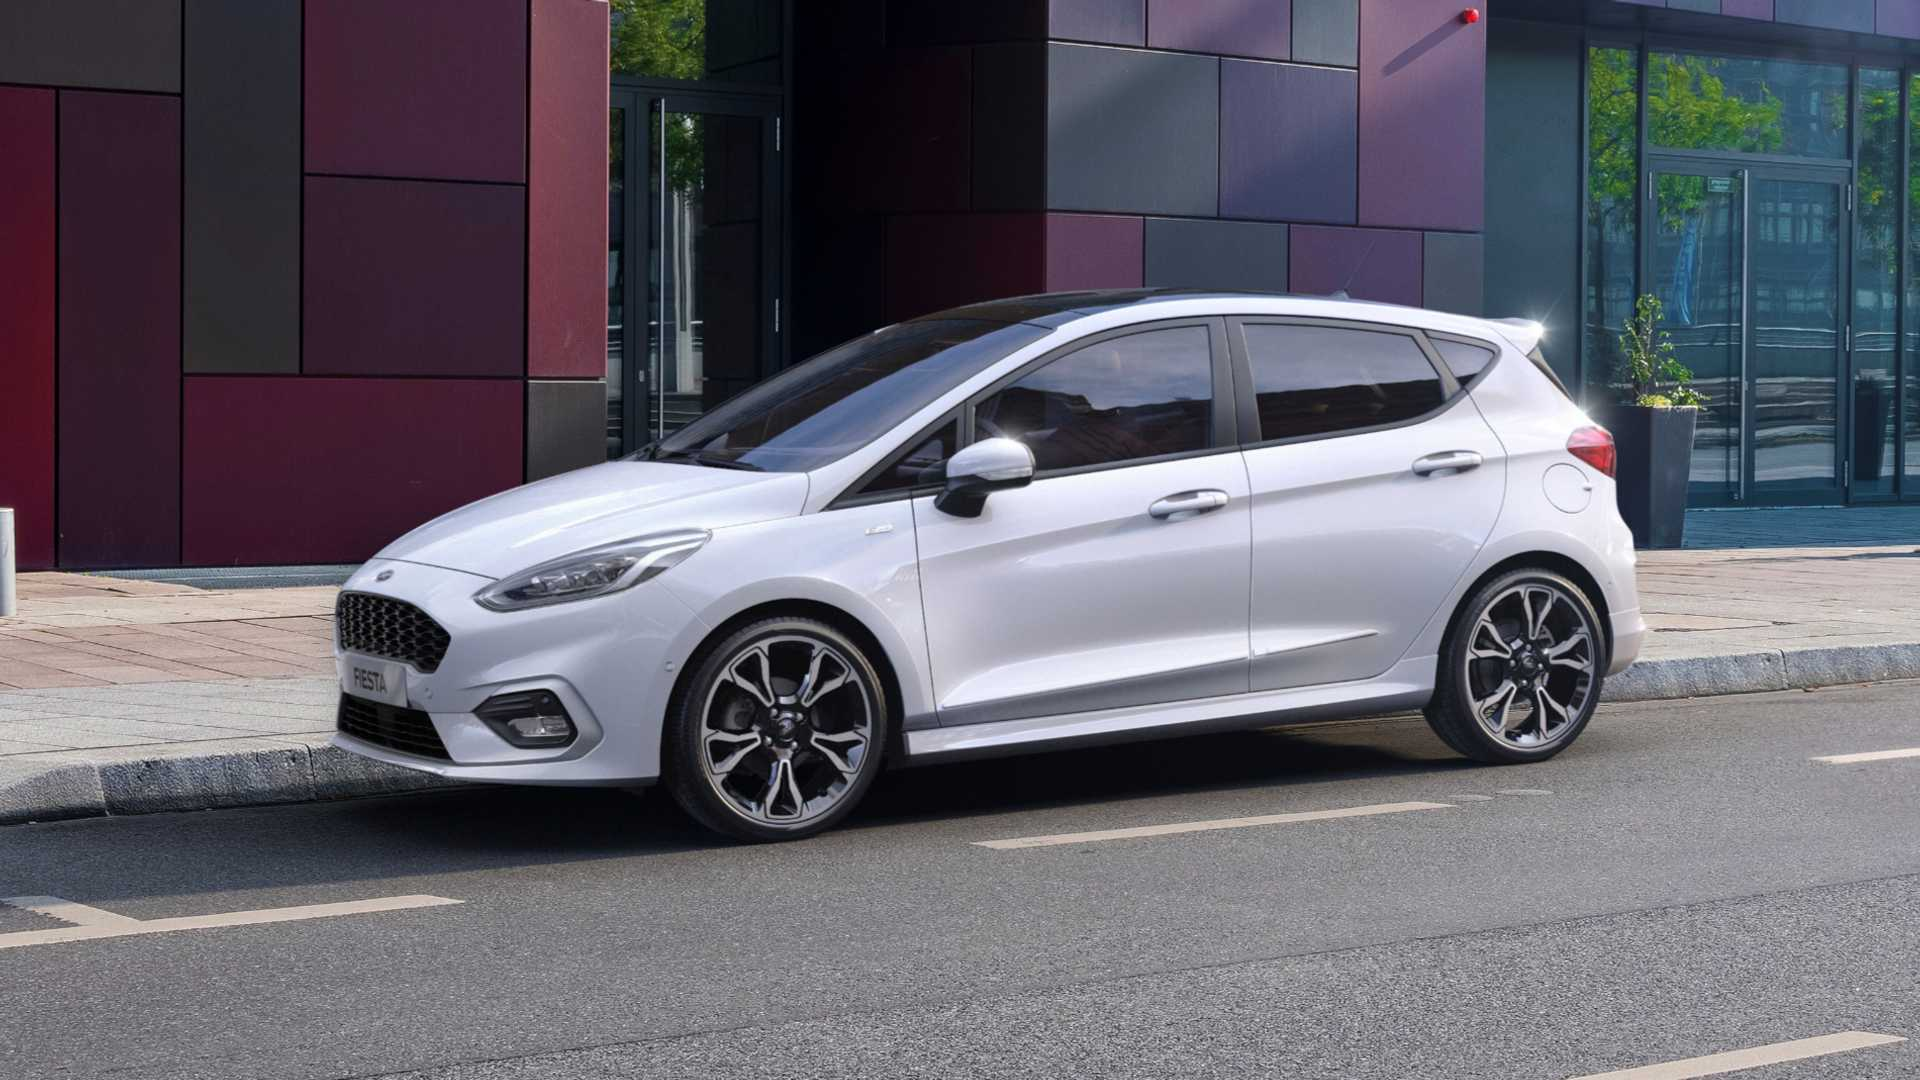 2020 Ford Fiesta Ratings